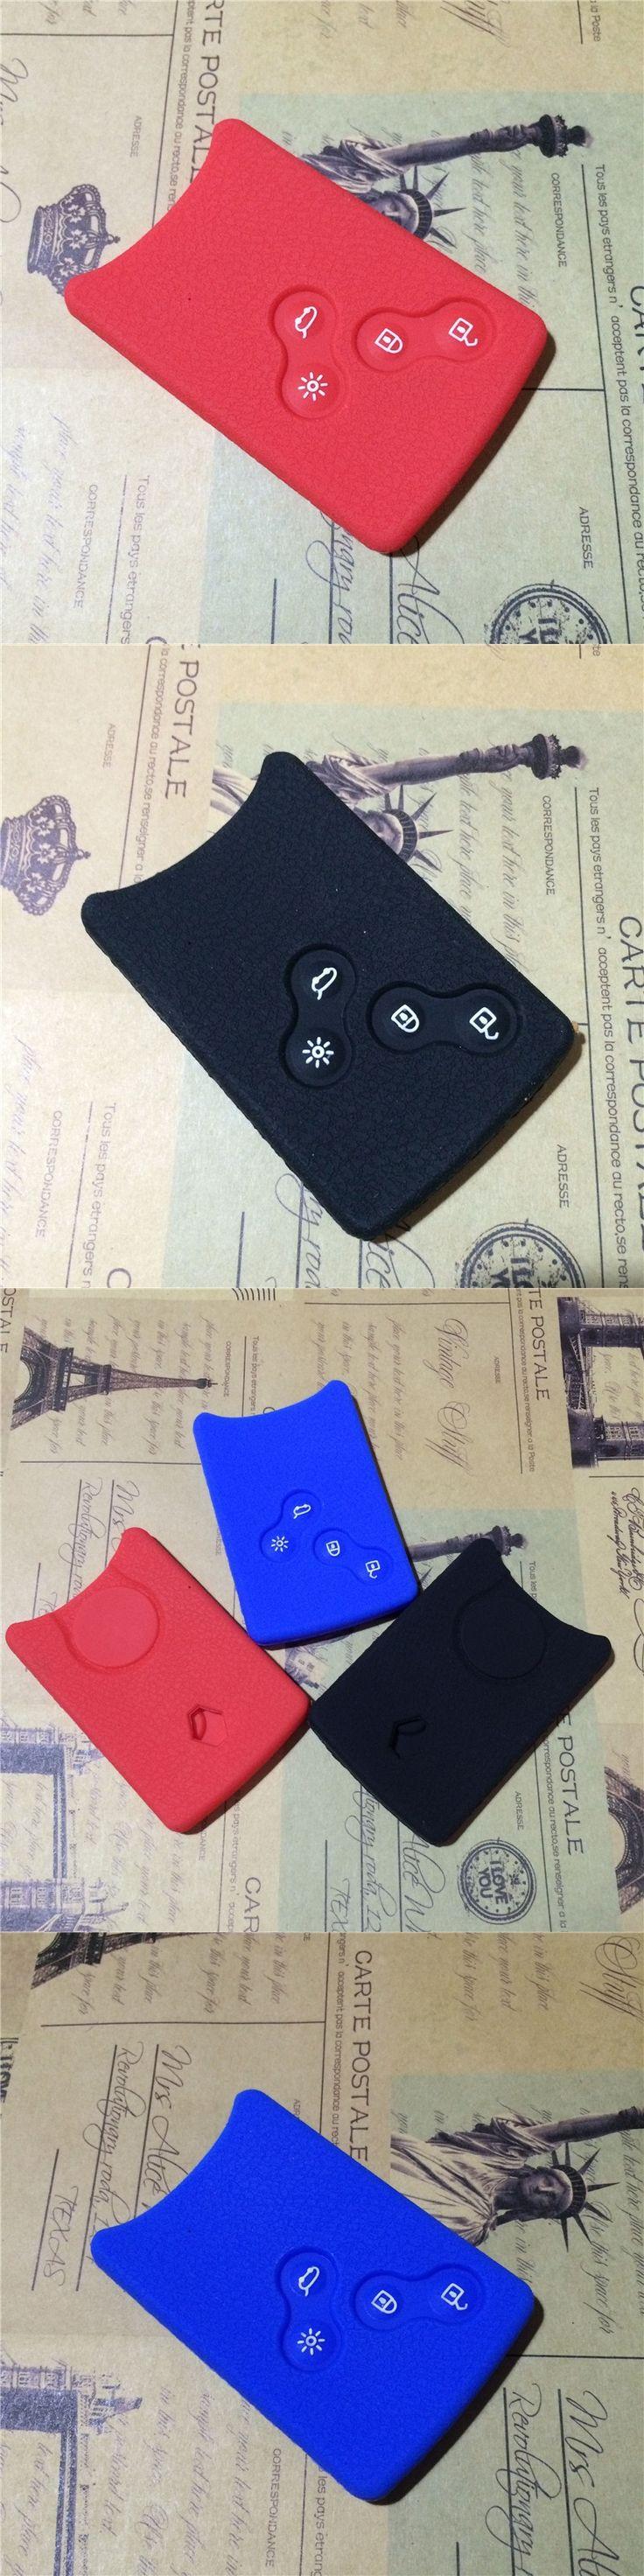 for Renault Clio Scenic Megane Duster Sandero Captur Twingo koleos remote silicone key cover case 4 buttons wallet holder